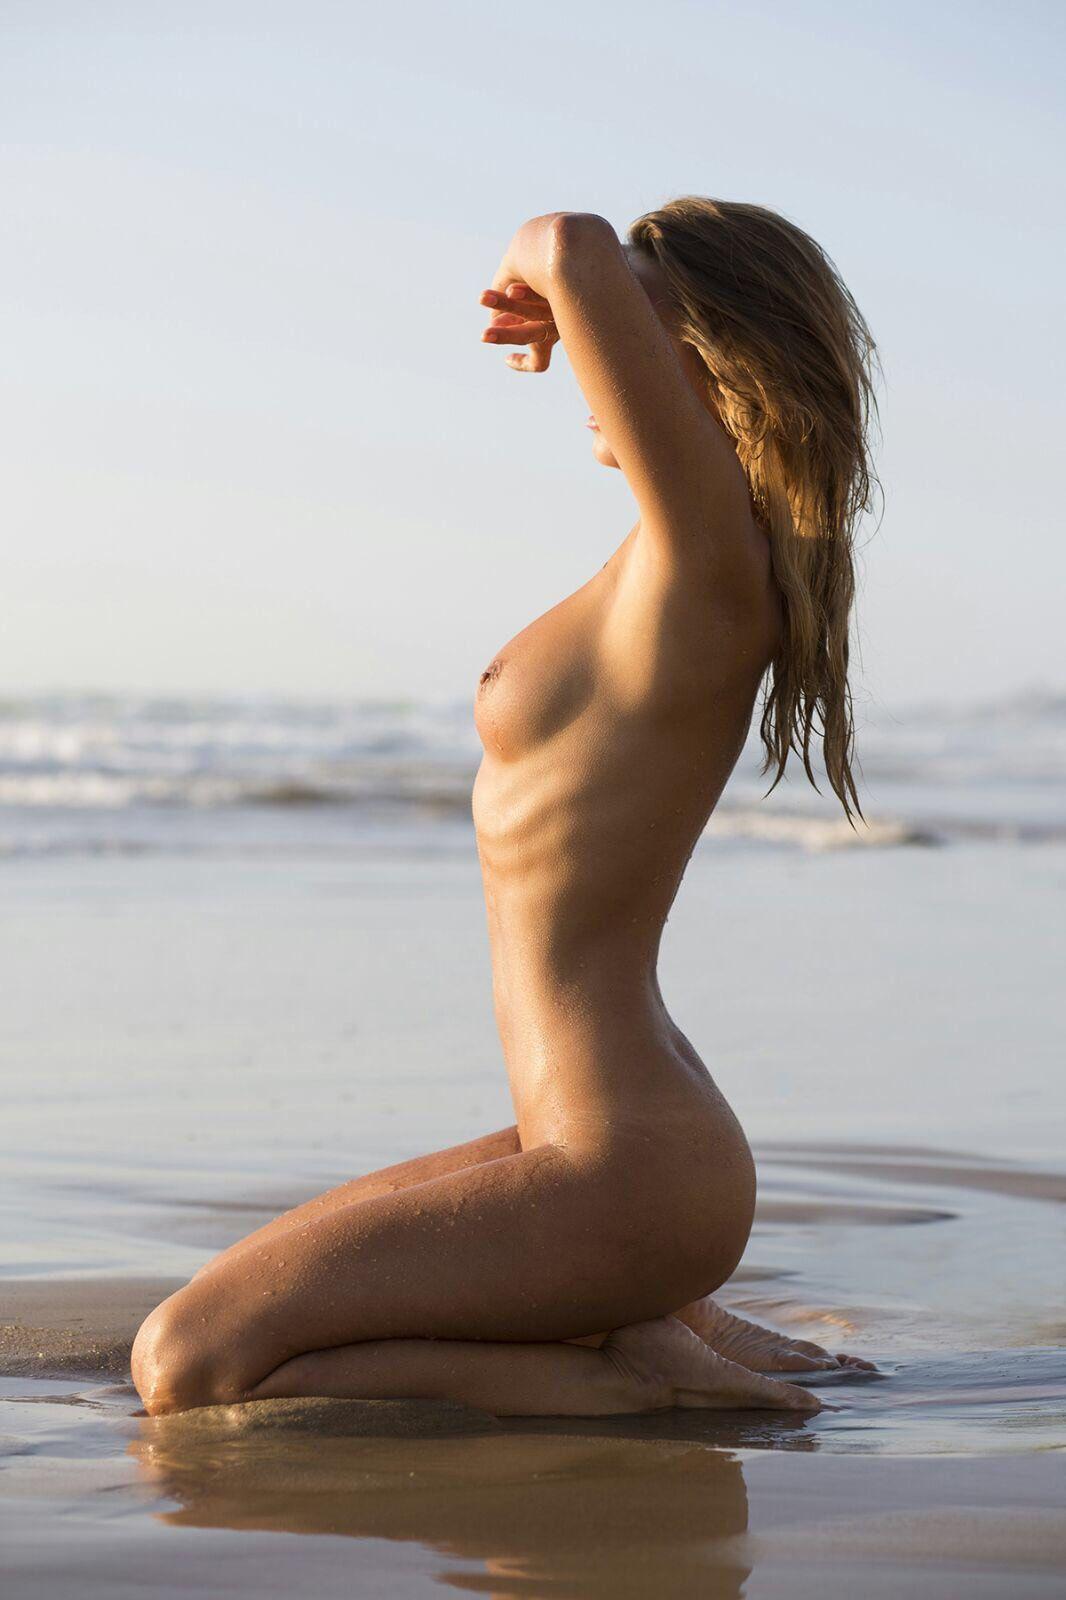 marisa-papen-naked-60991-thefappeningblog.com_.jpg